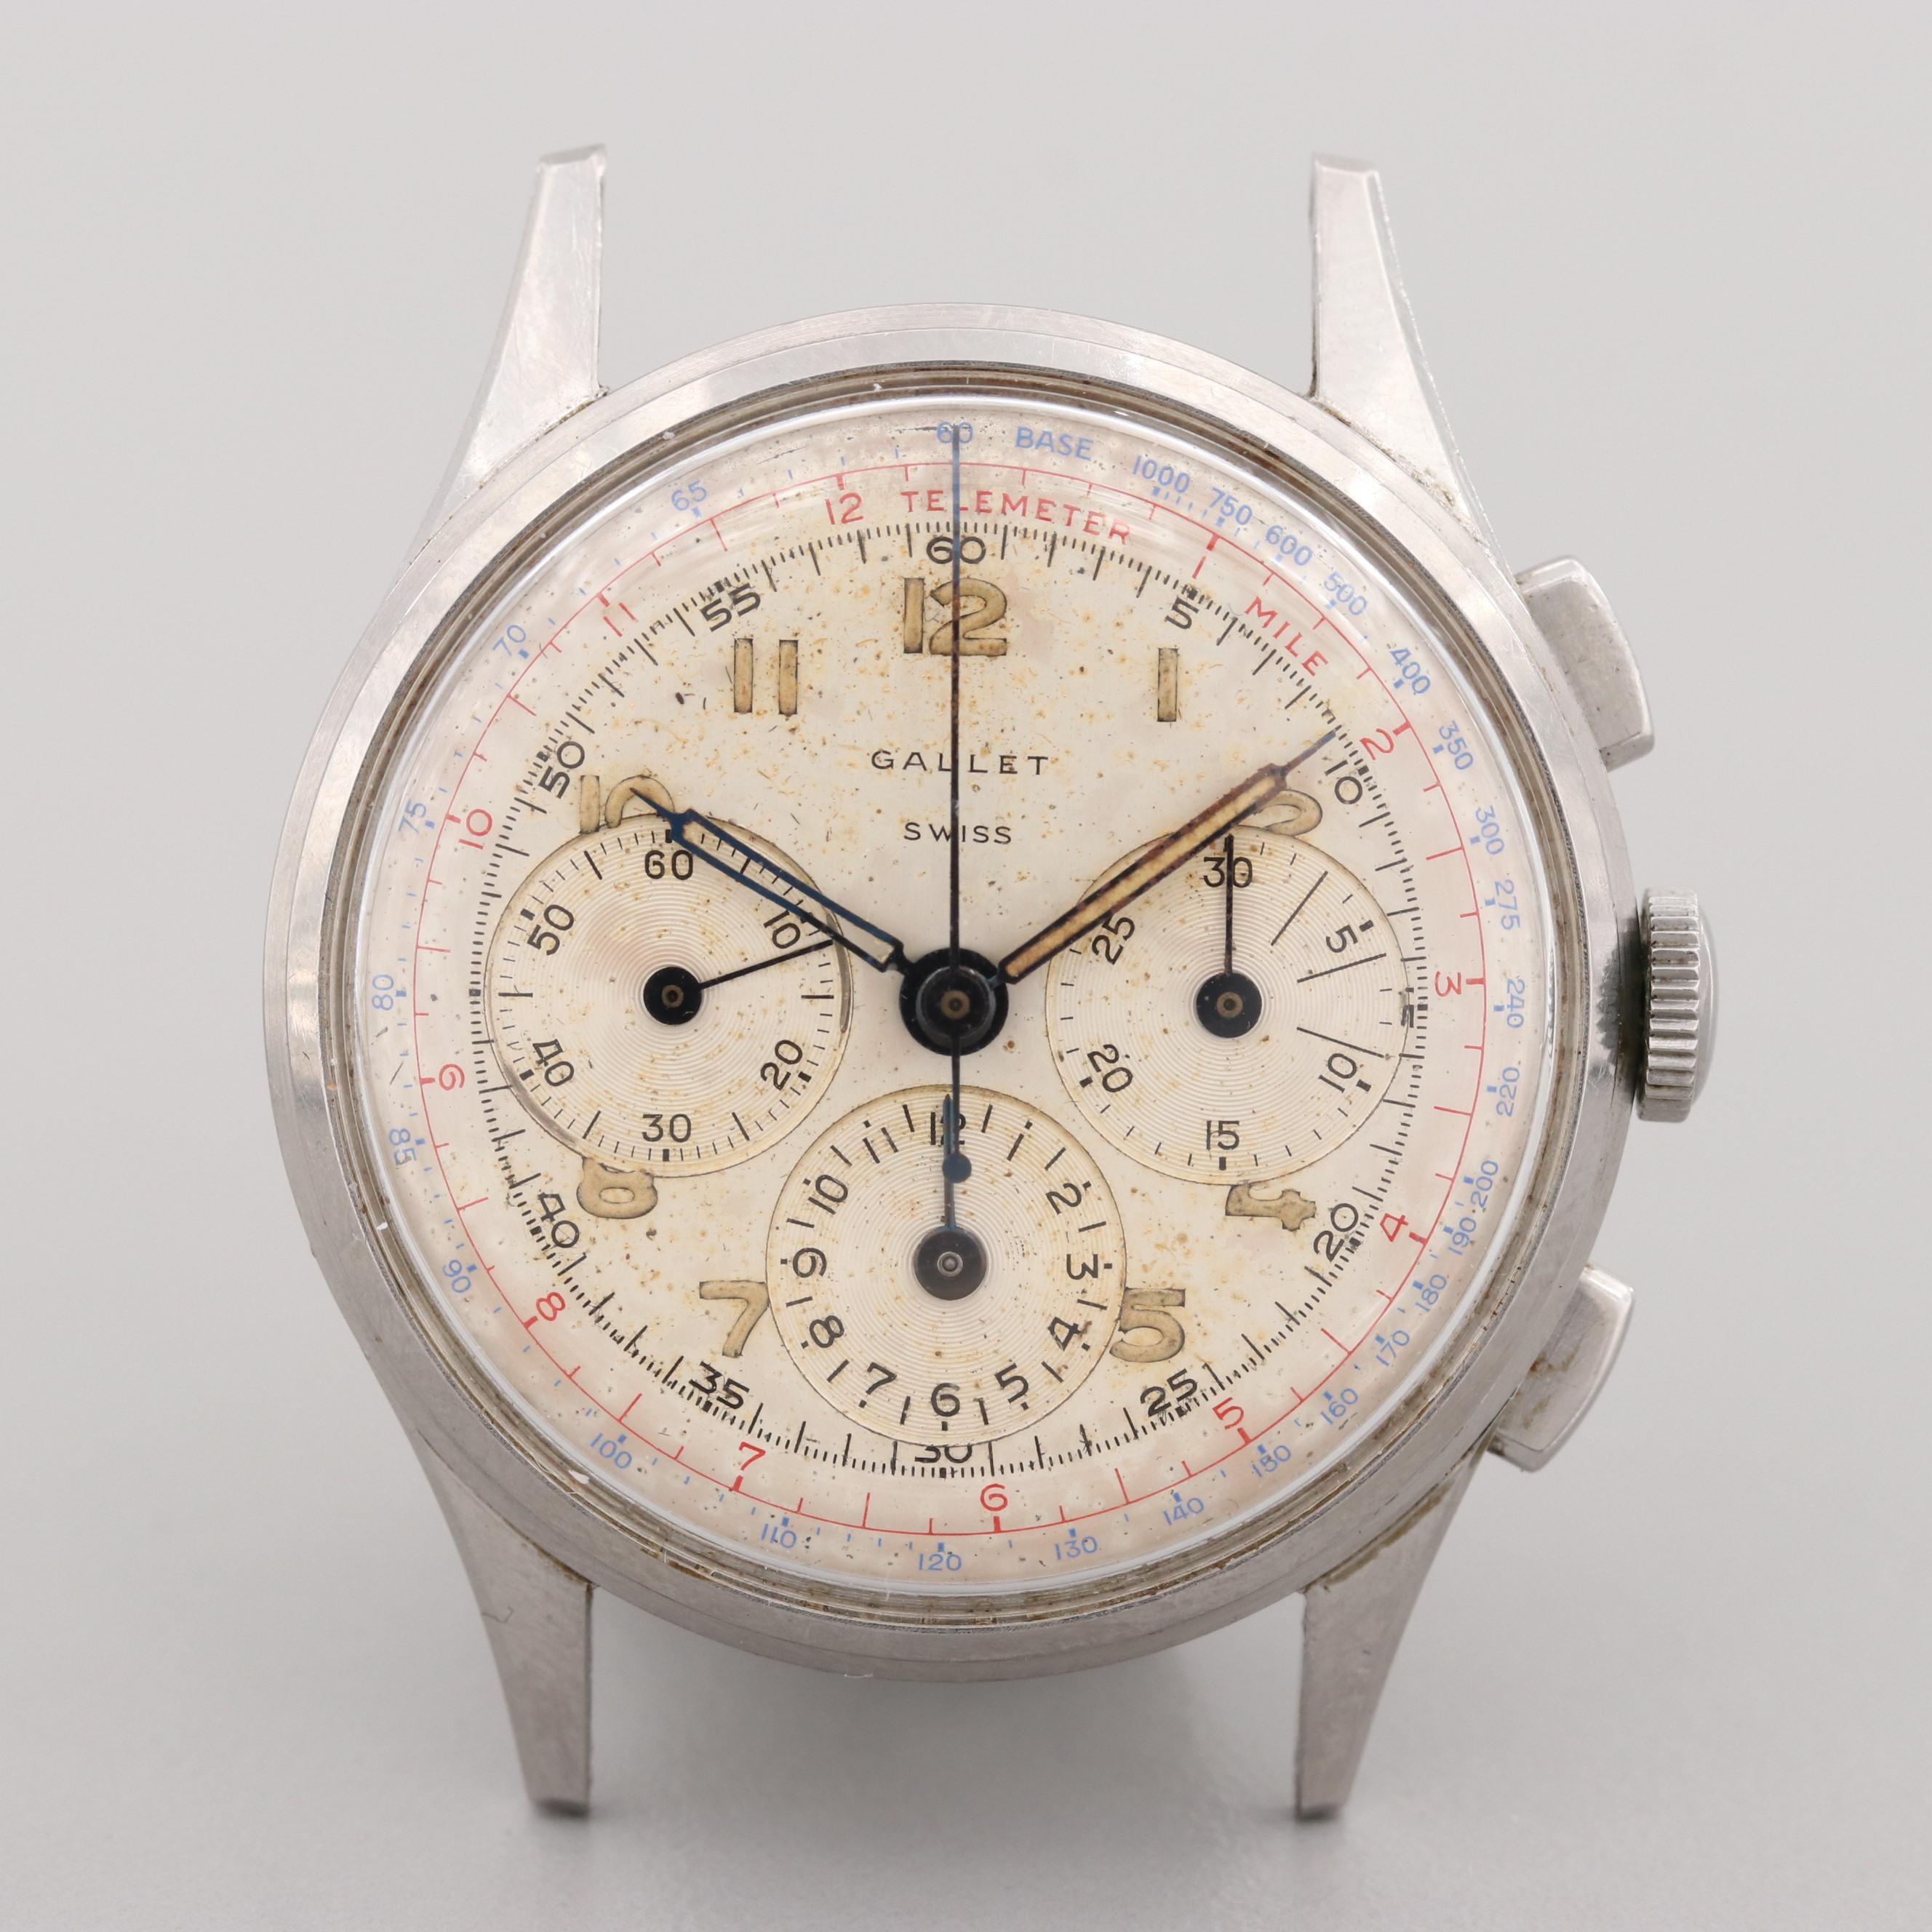 Vintage Gallet Multi Chron Stem Wind Chronograph Watch